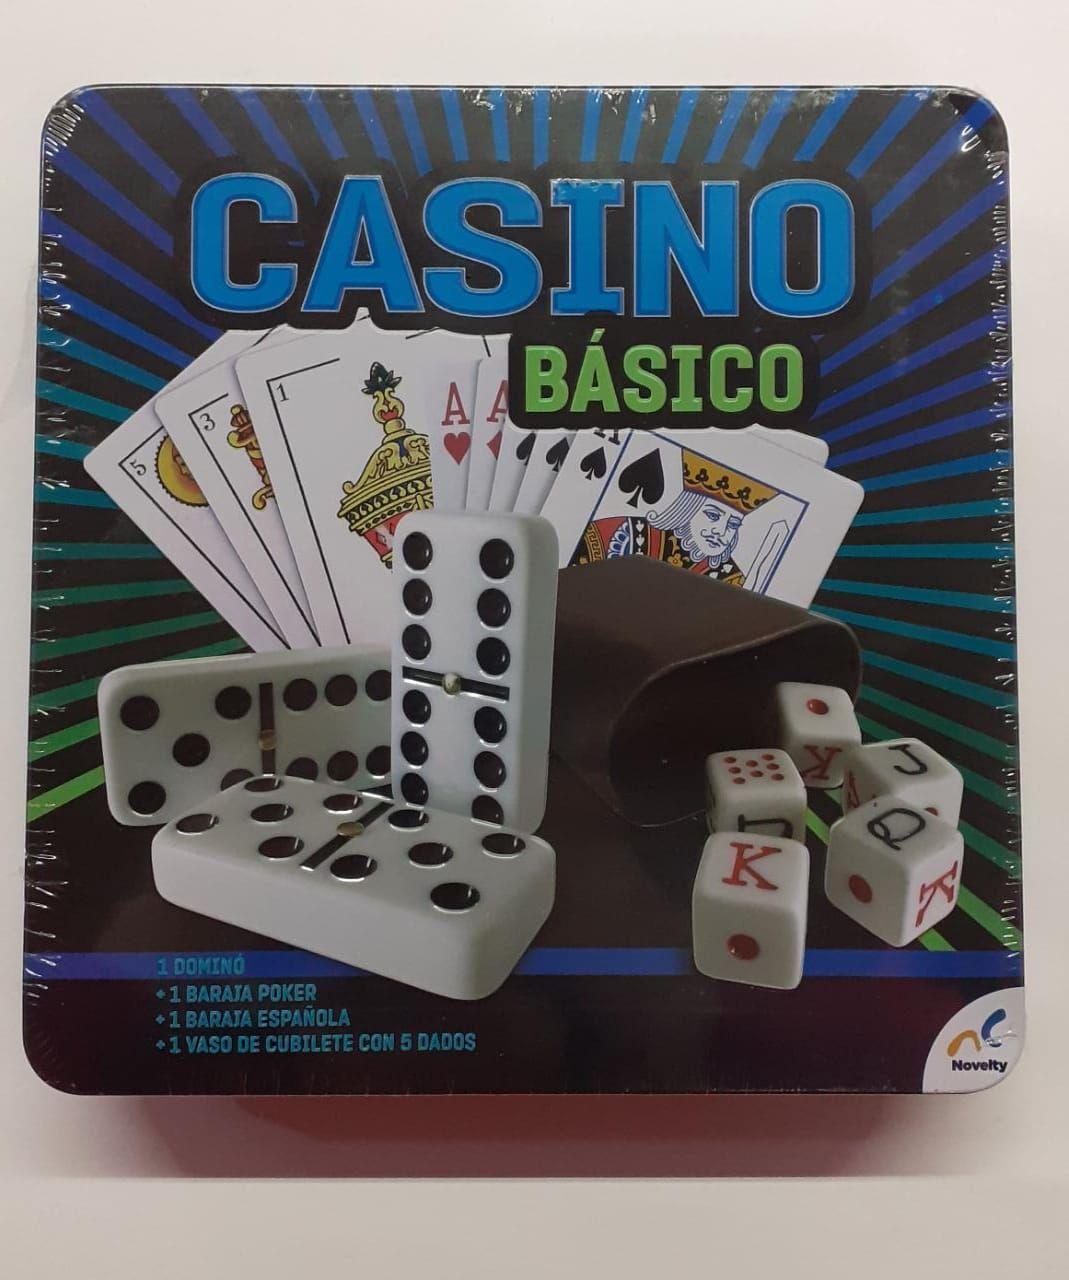 CASINO BASICO 4 EN 1